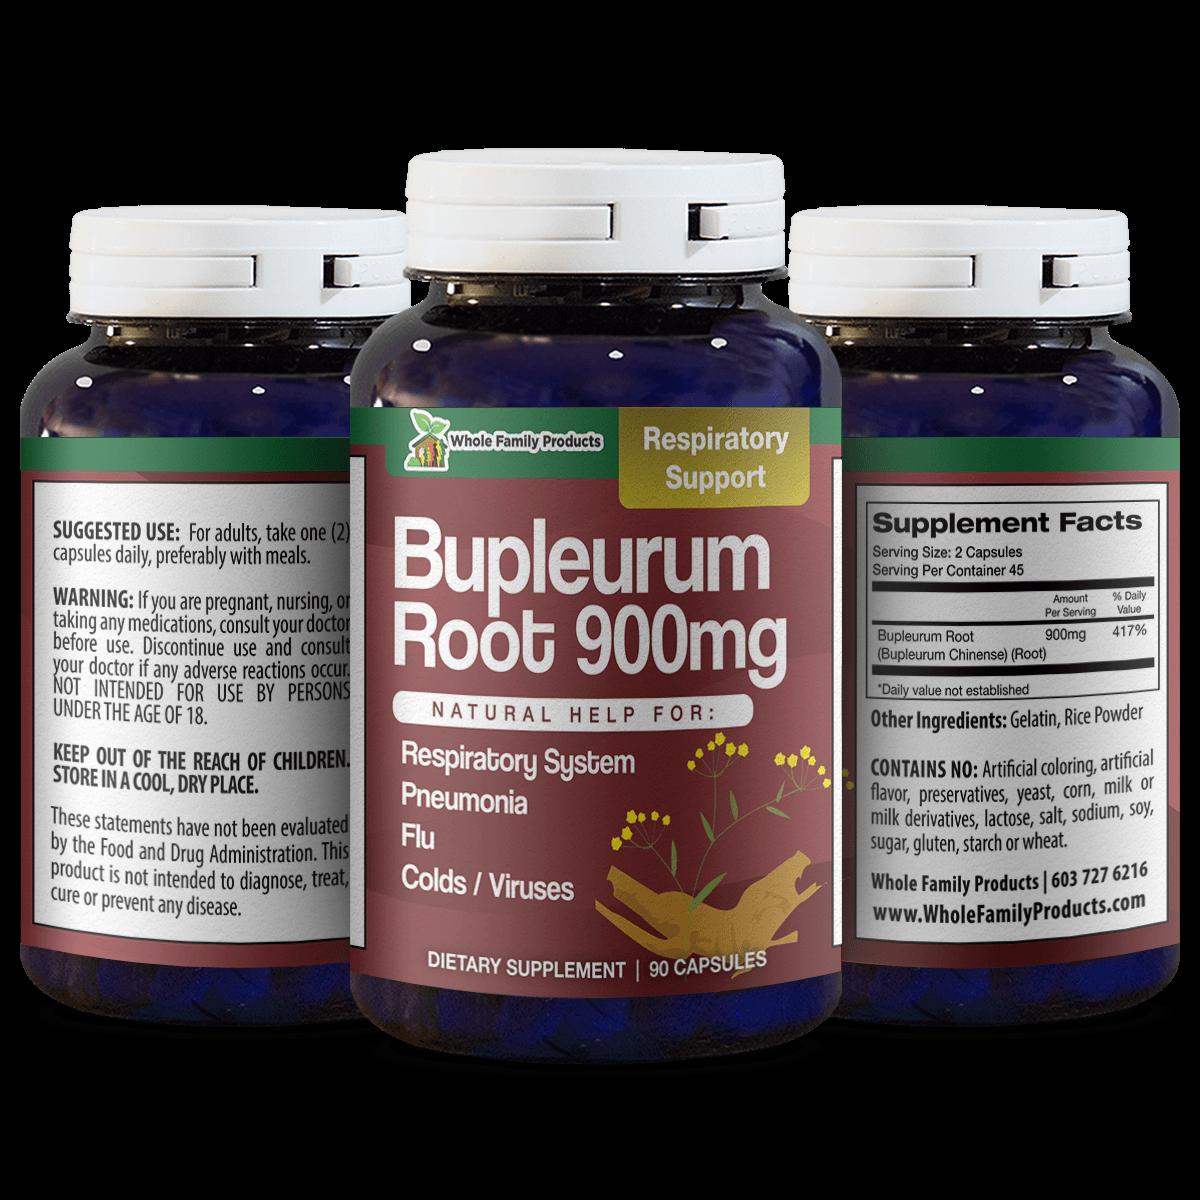 Bupleurum Root 90 Capsules Natural Help For Flu Cold and Viruses